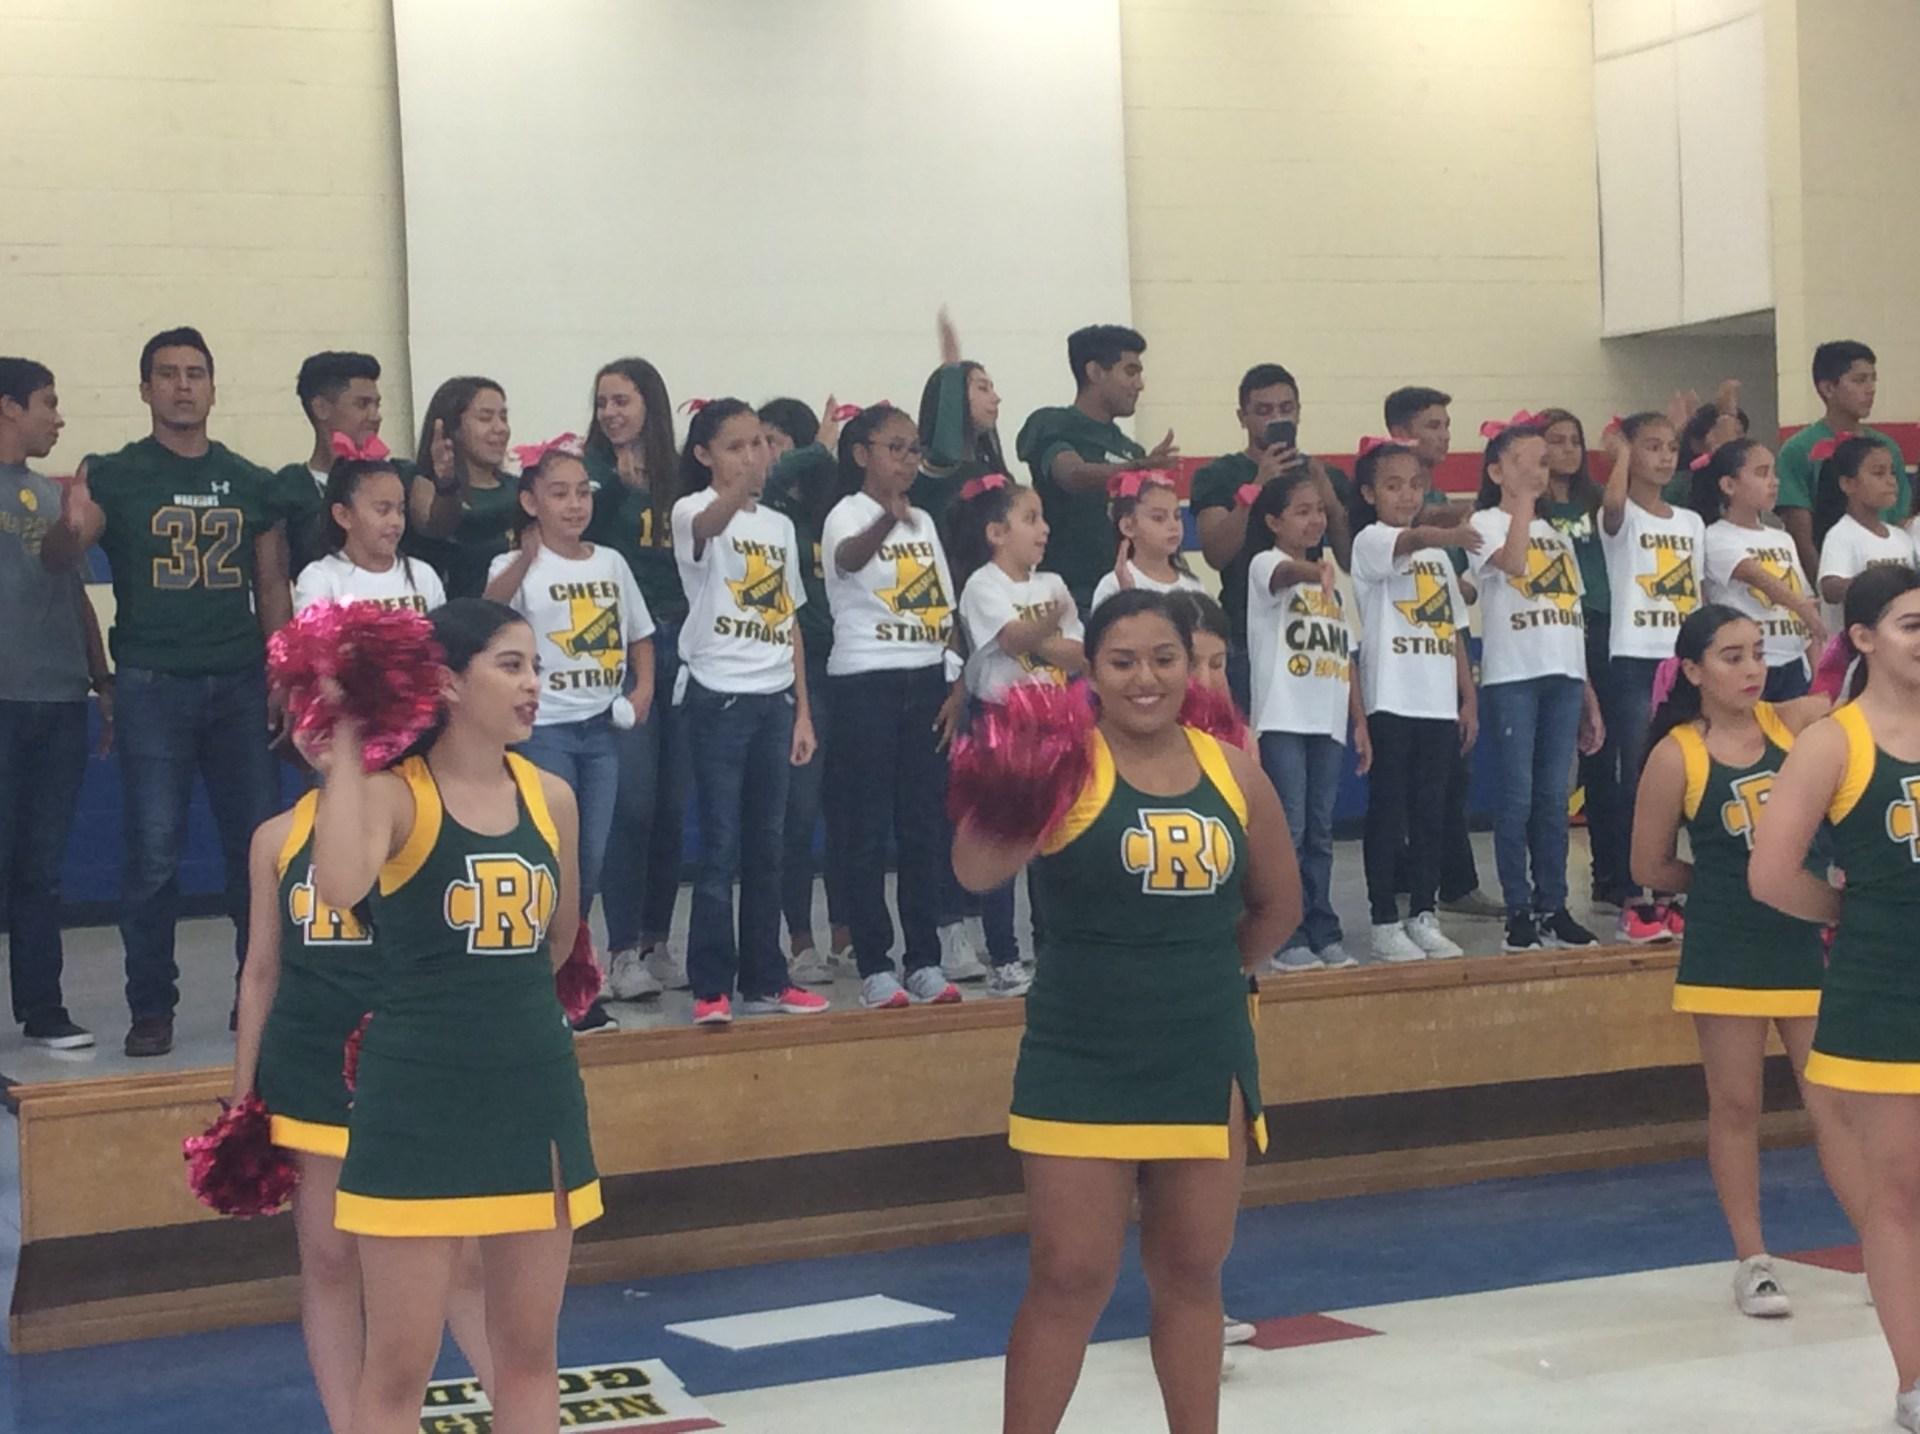 with Nikki Rowe cheerleaders